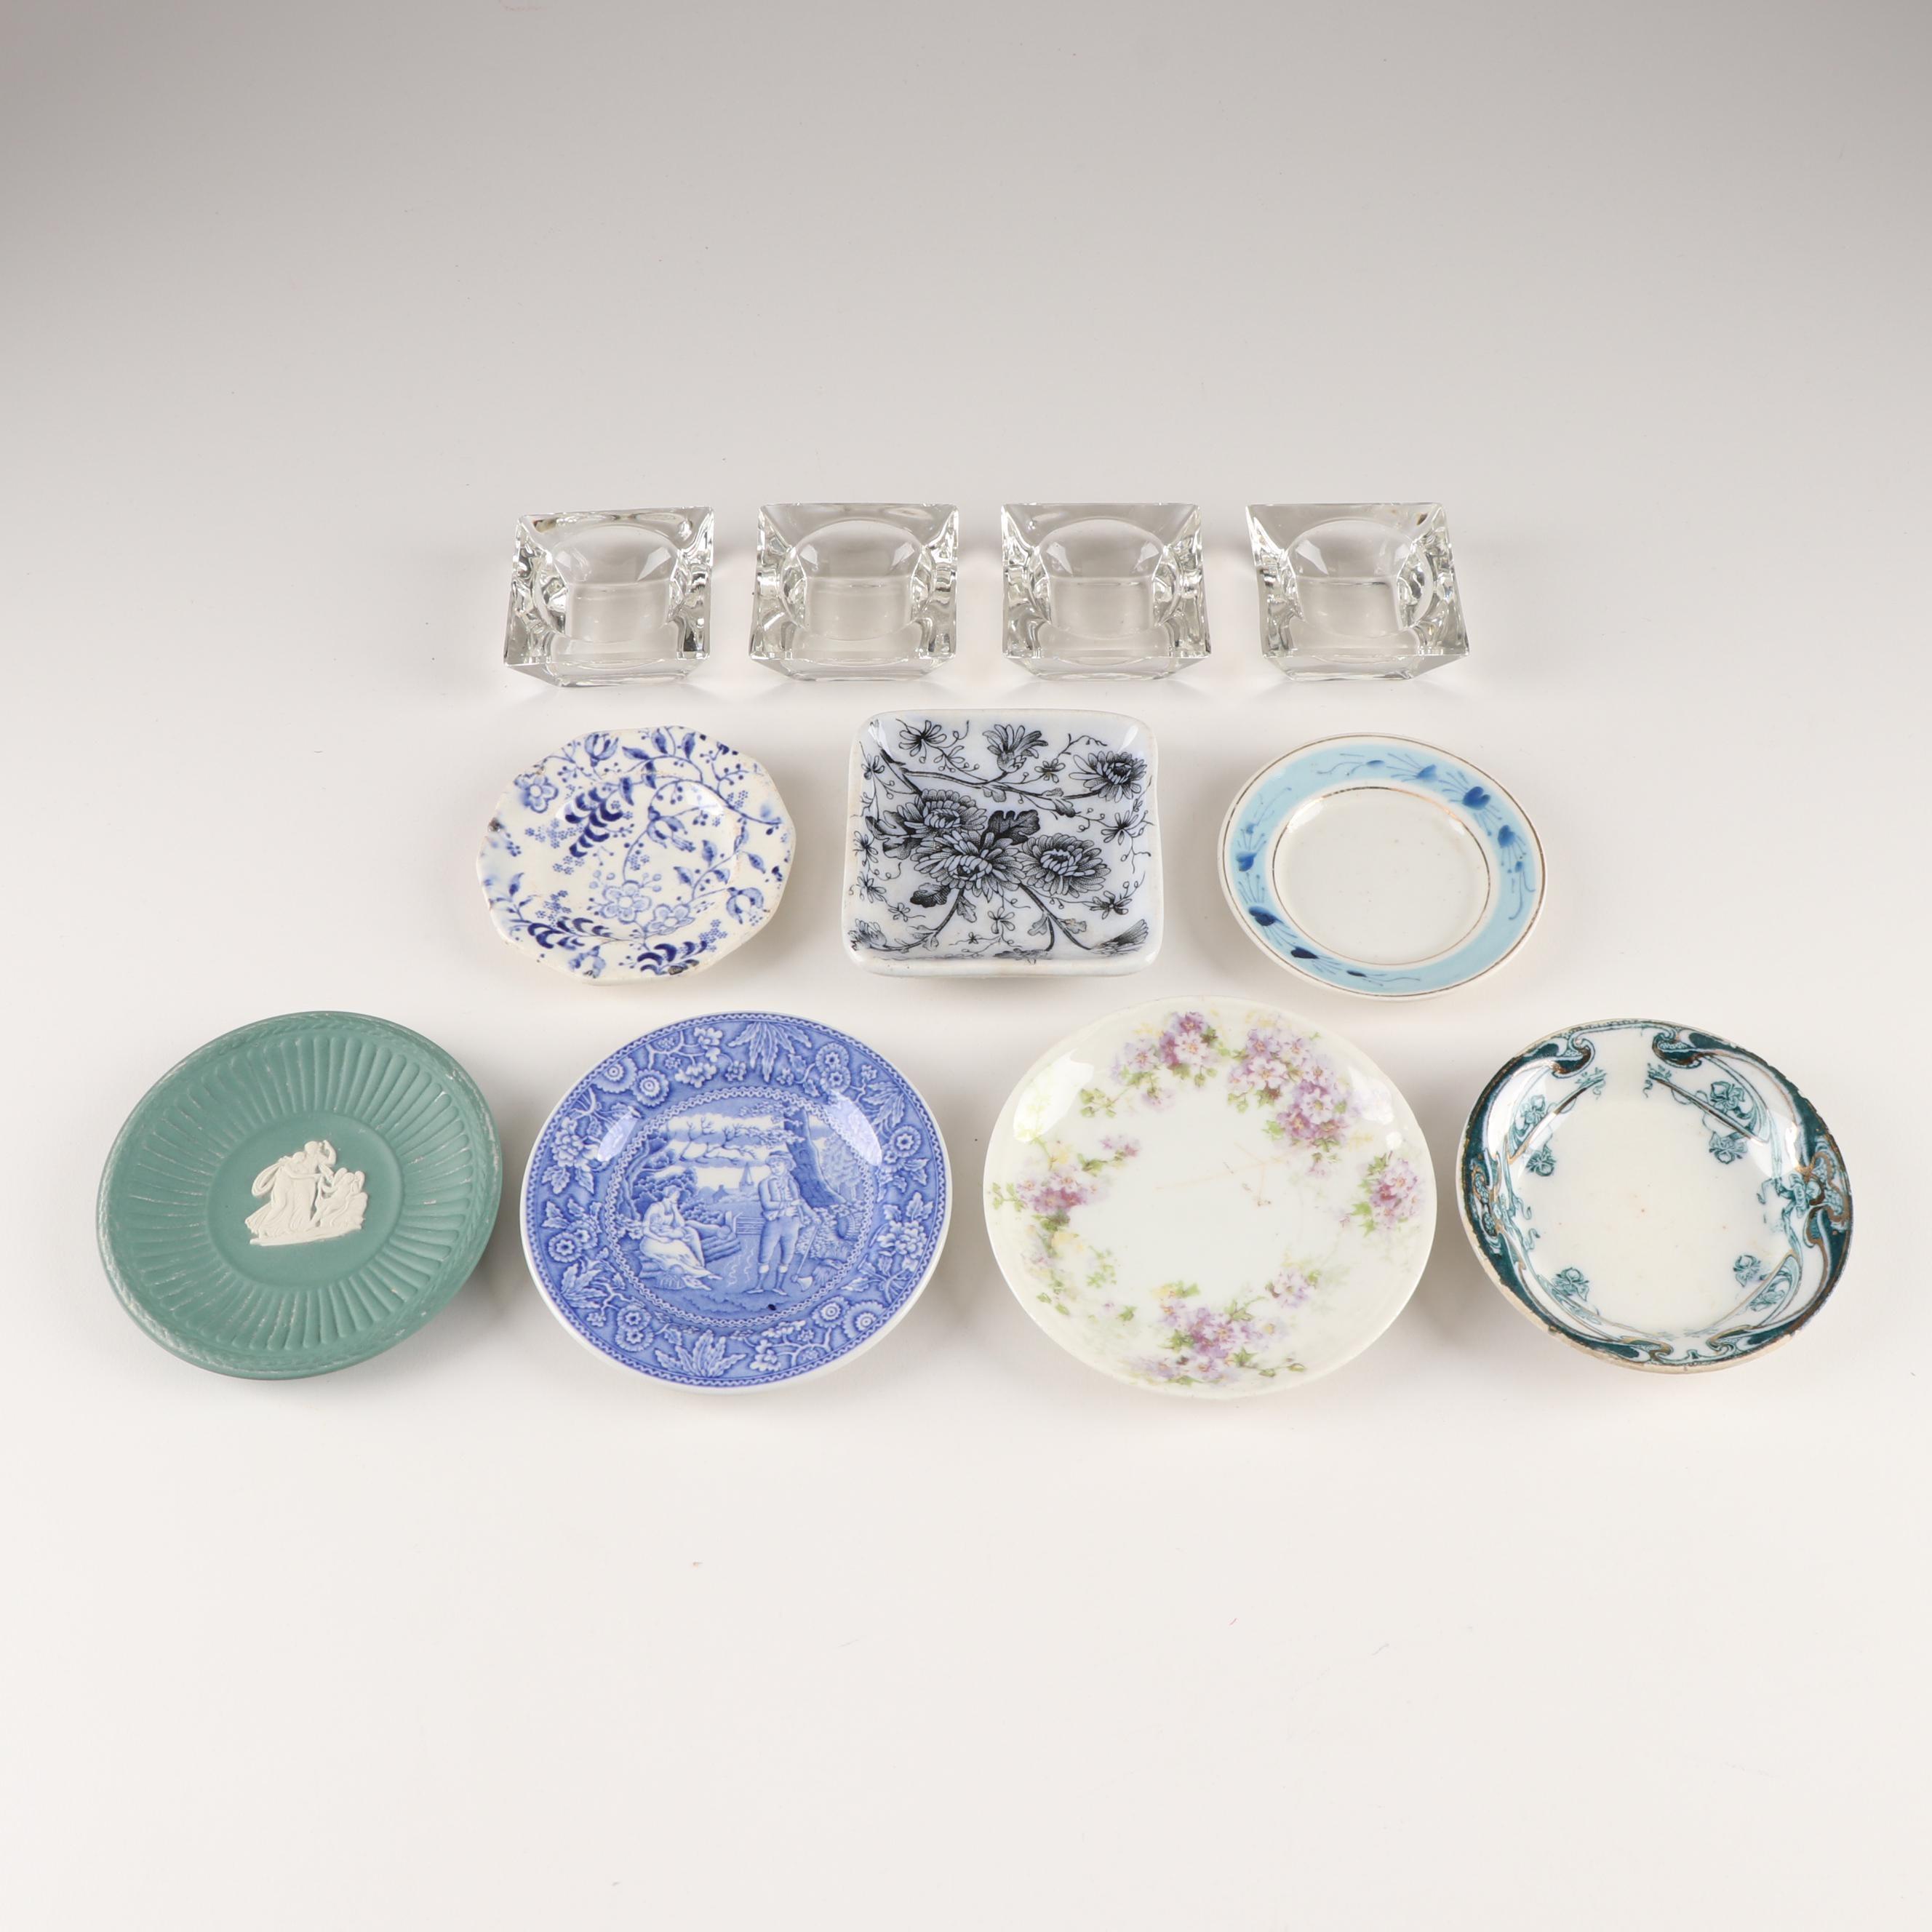 Ceramic Butter Pats and Glass Salt Cellars